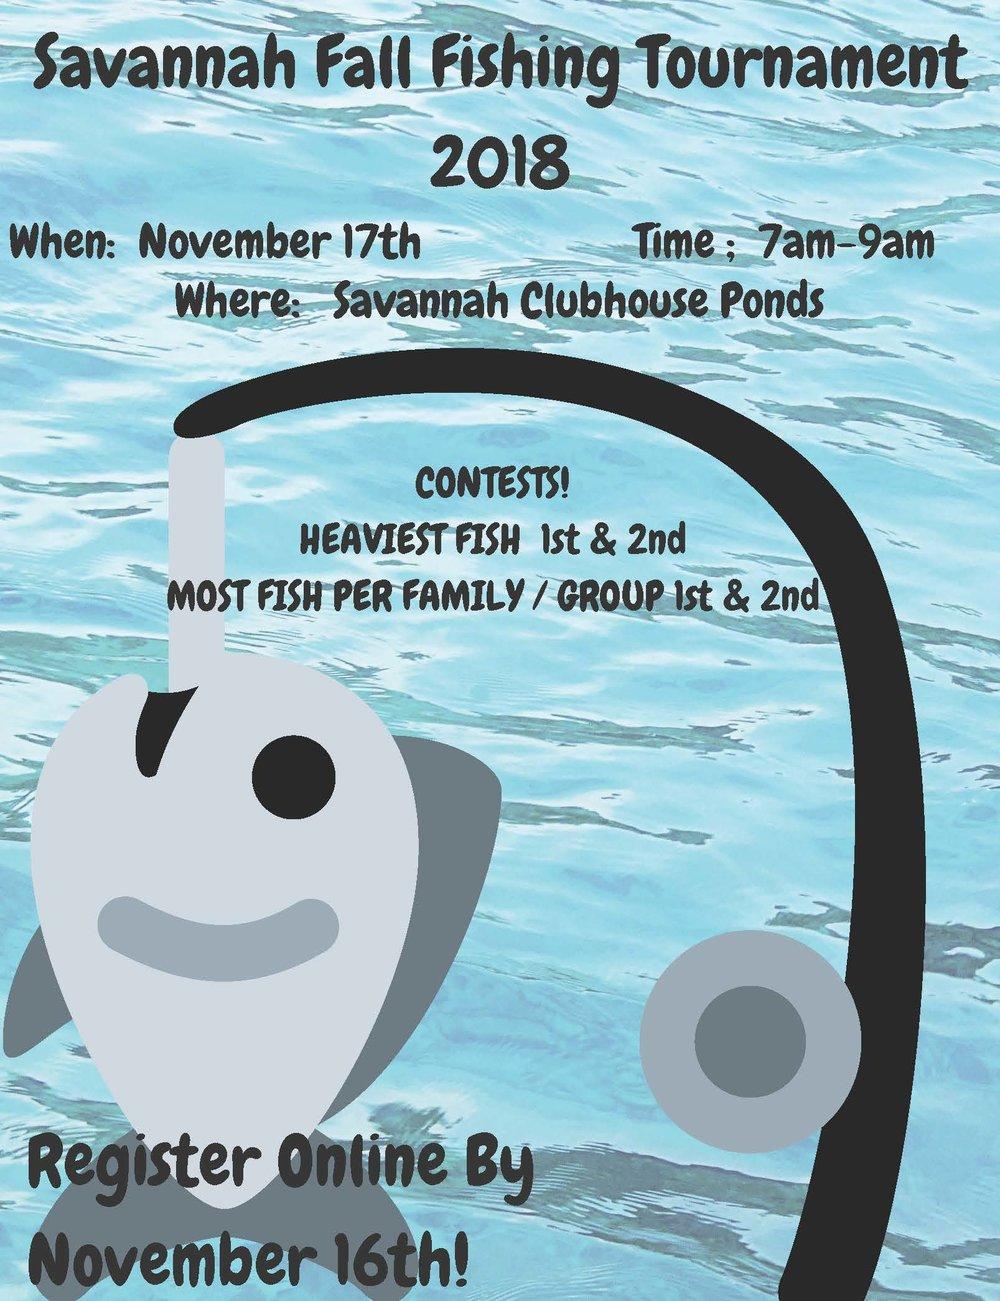 Savannah Fall Fishing Tournament 2018.jpg